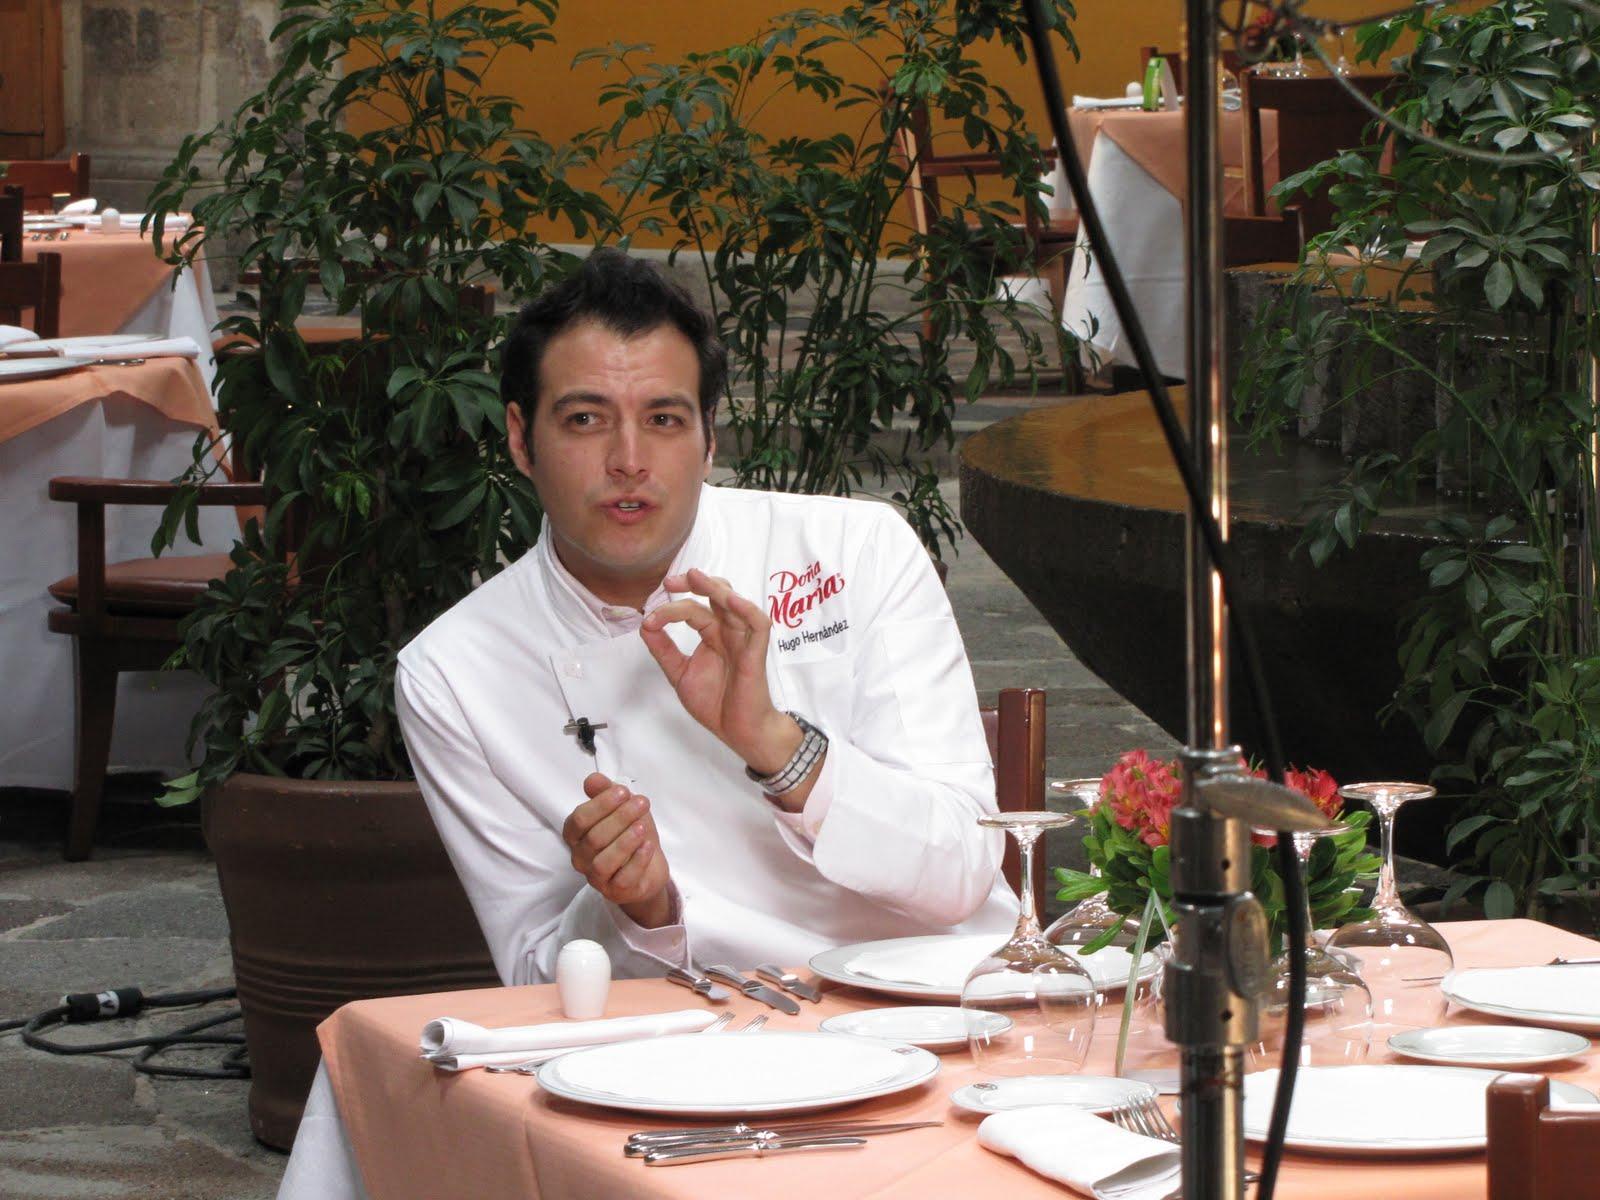 Todocultura la deconstrucci n del mole seg n el chef for Deconstruccion gastronomica